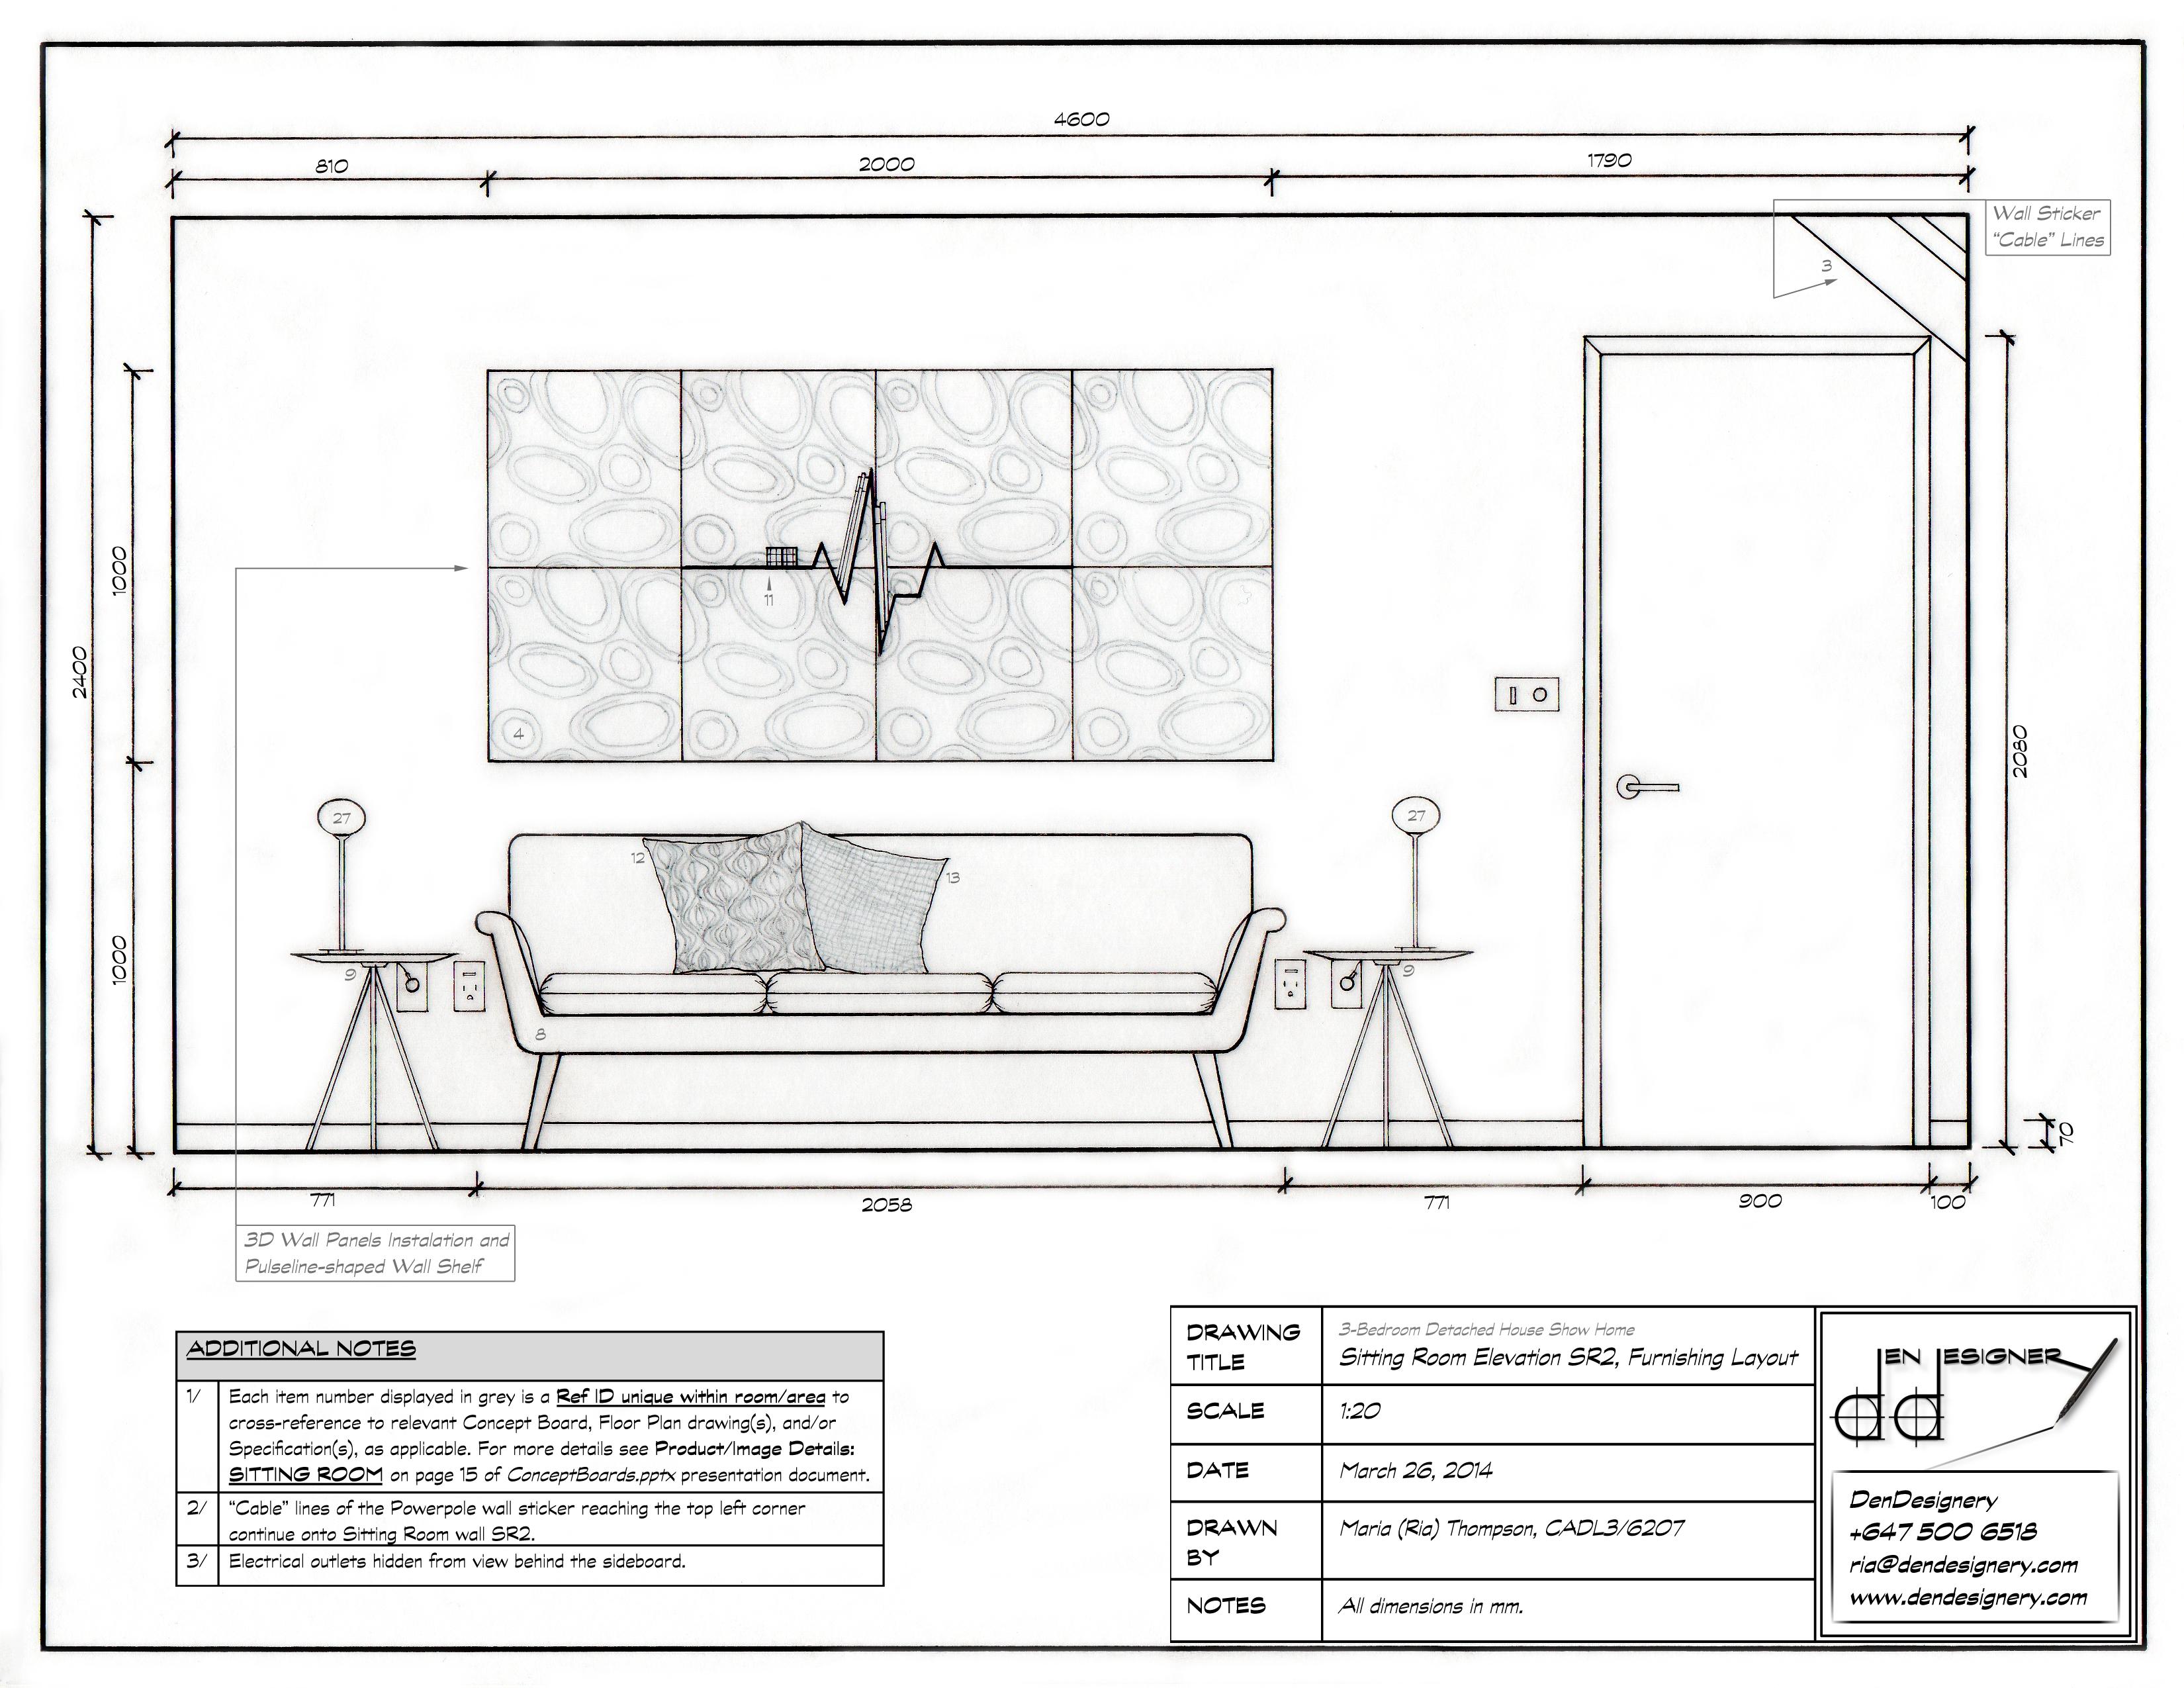 3 Bedroom Detached Show Home Drawings  Den Designery